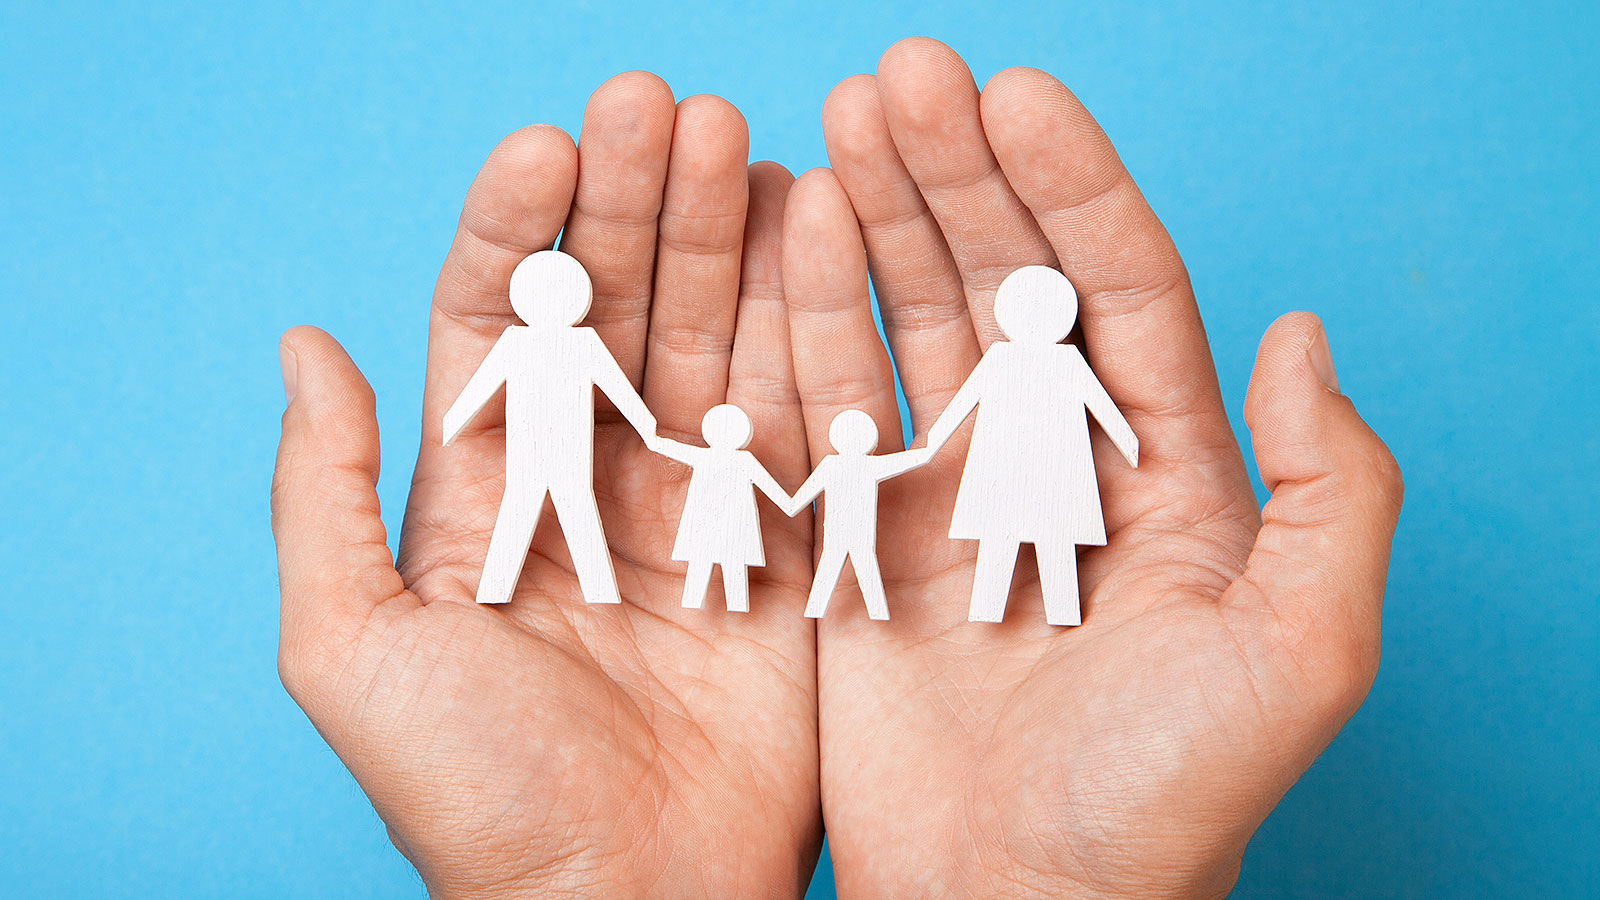 Life Insurance Made Your Life Easy - Nerd's Magazine